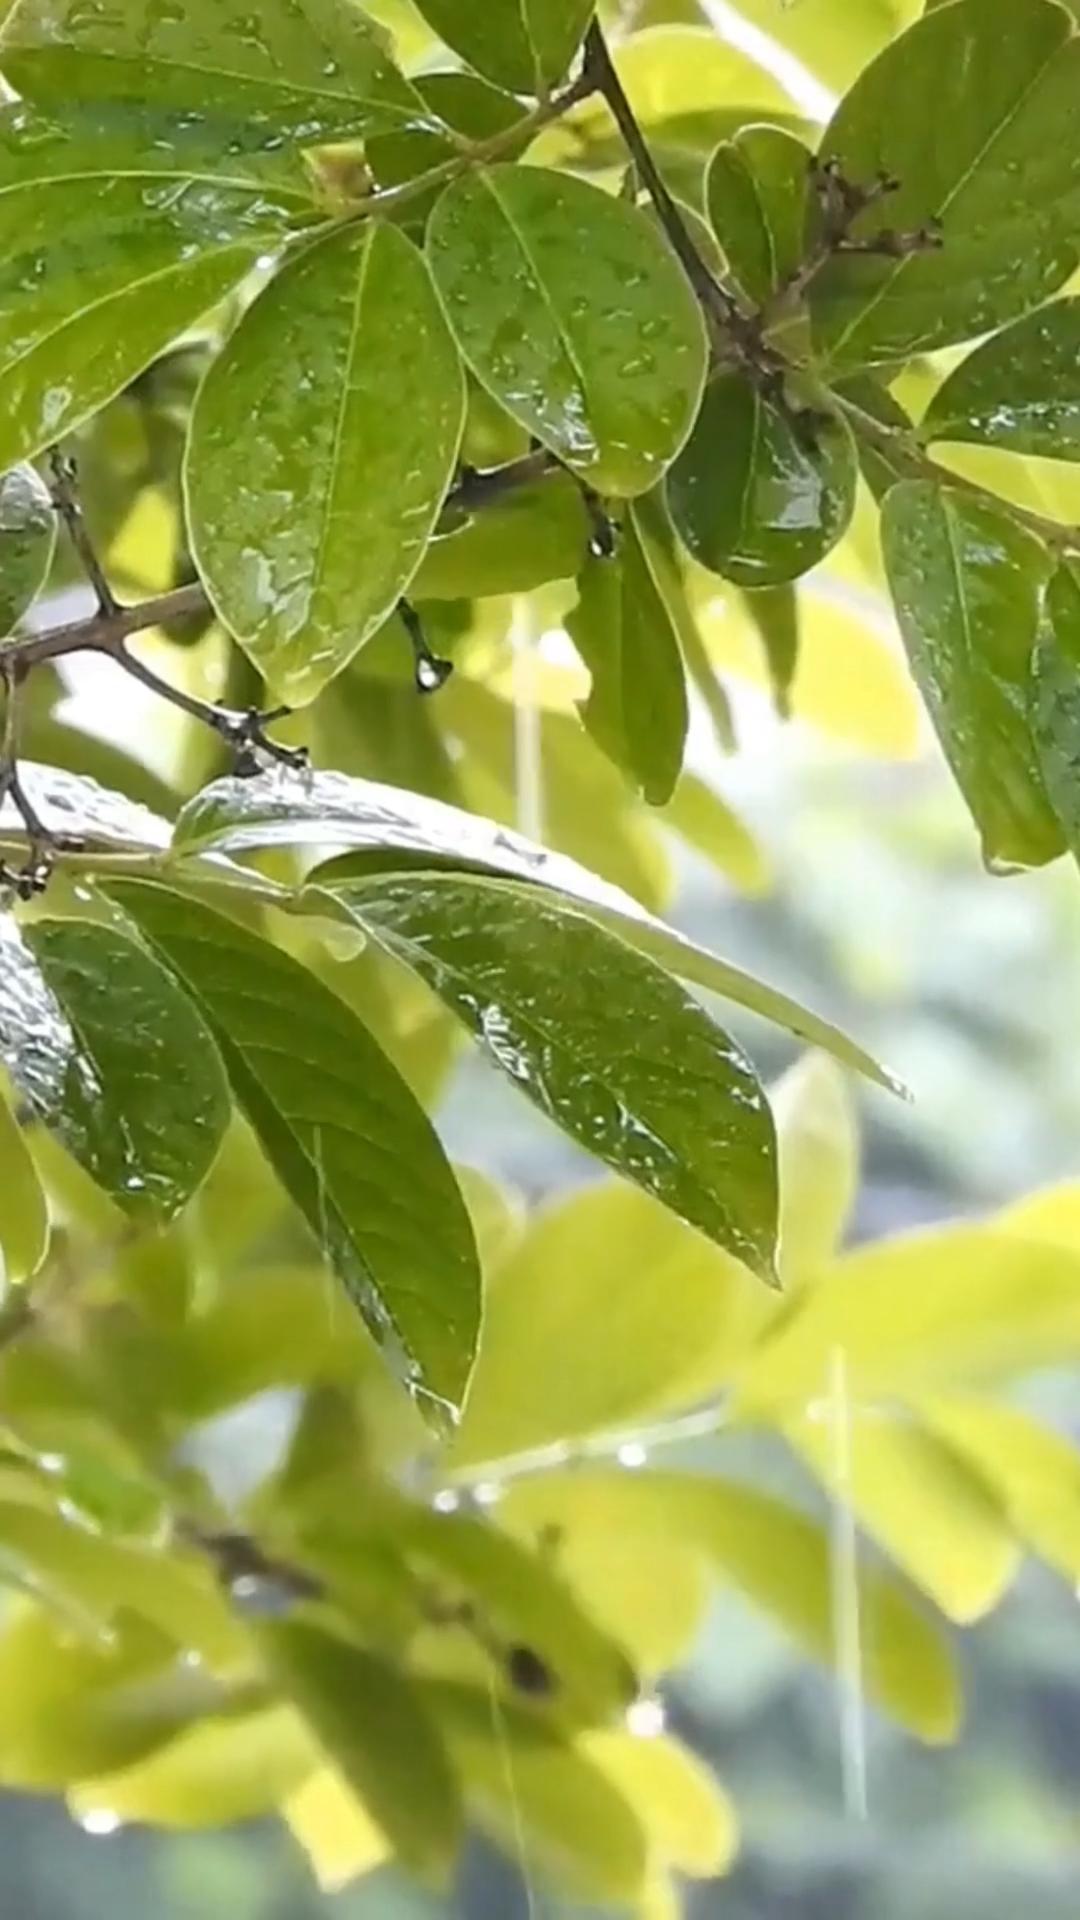 Rain Sounds and Music for Sleeping 3 Hours - Beautiful Relaxing Rain Sceneries